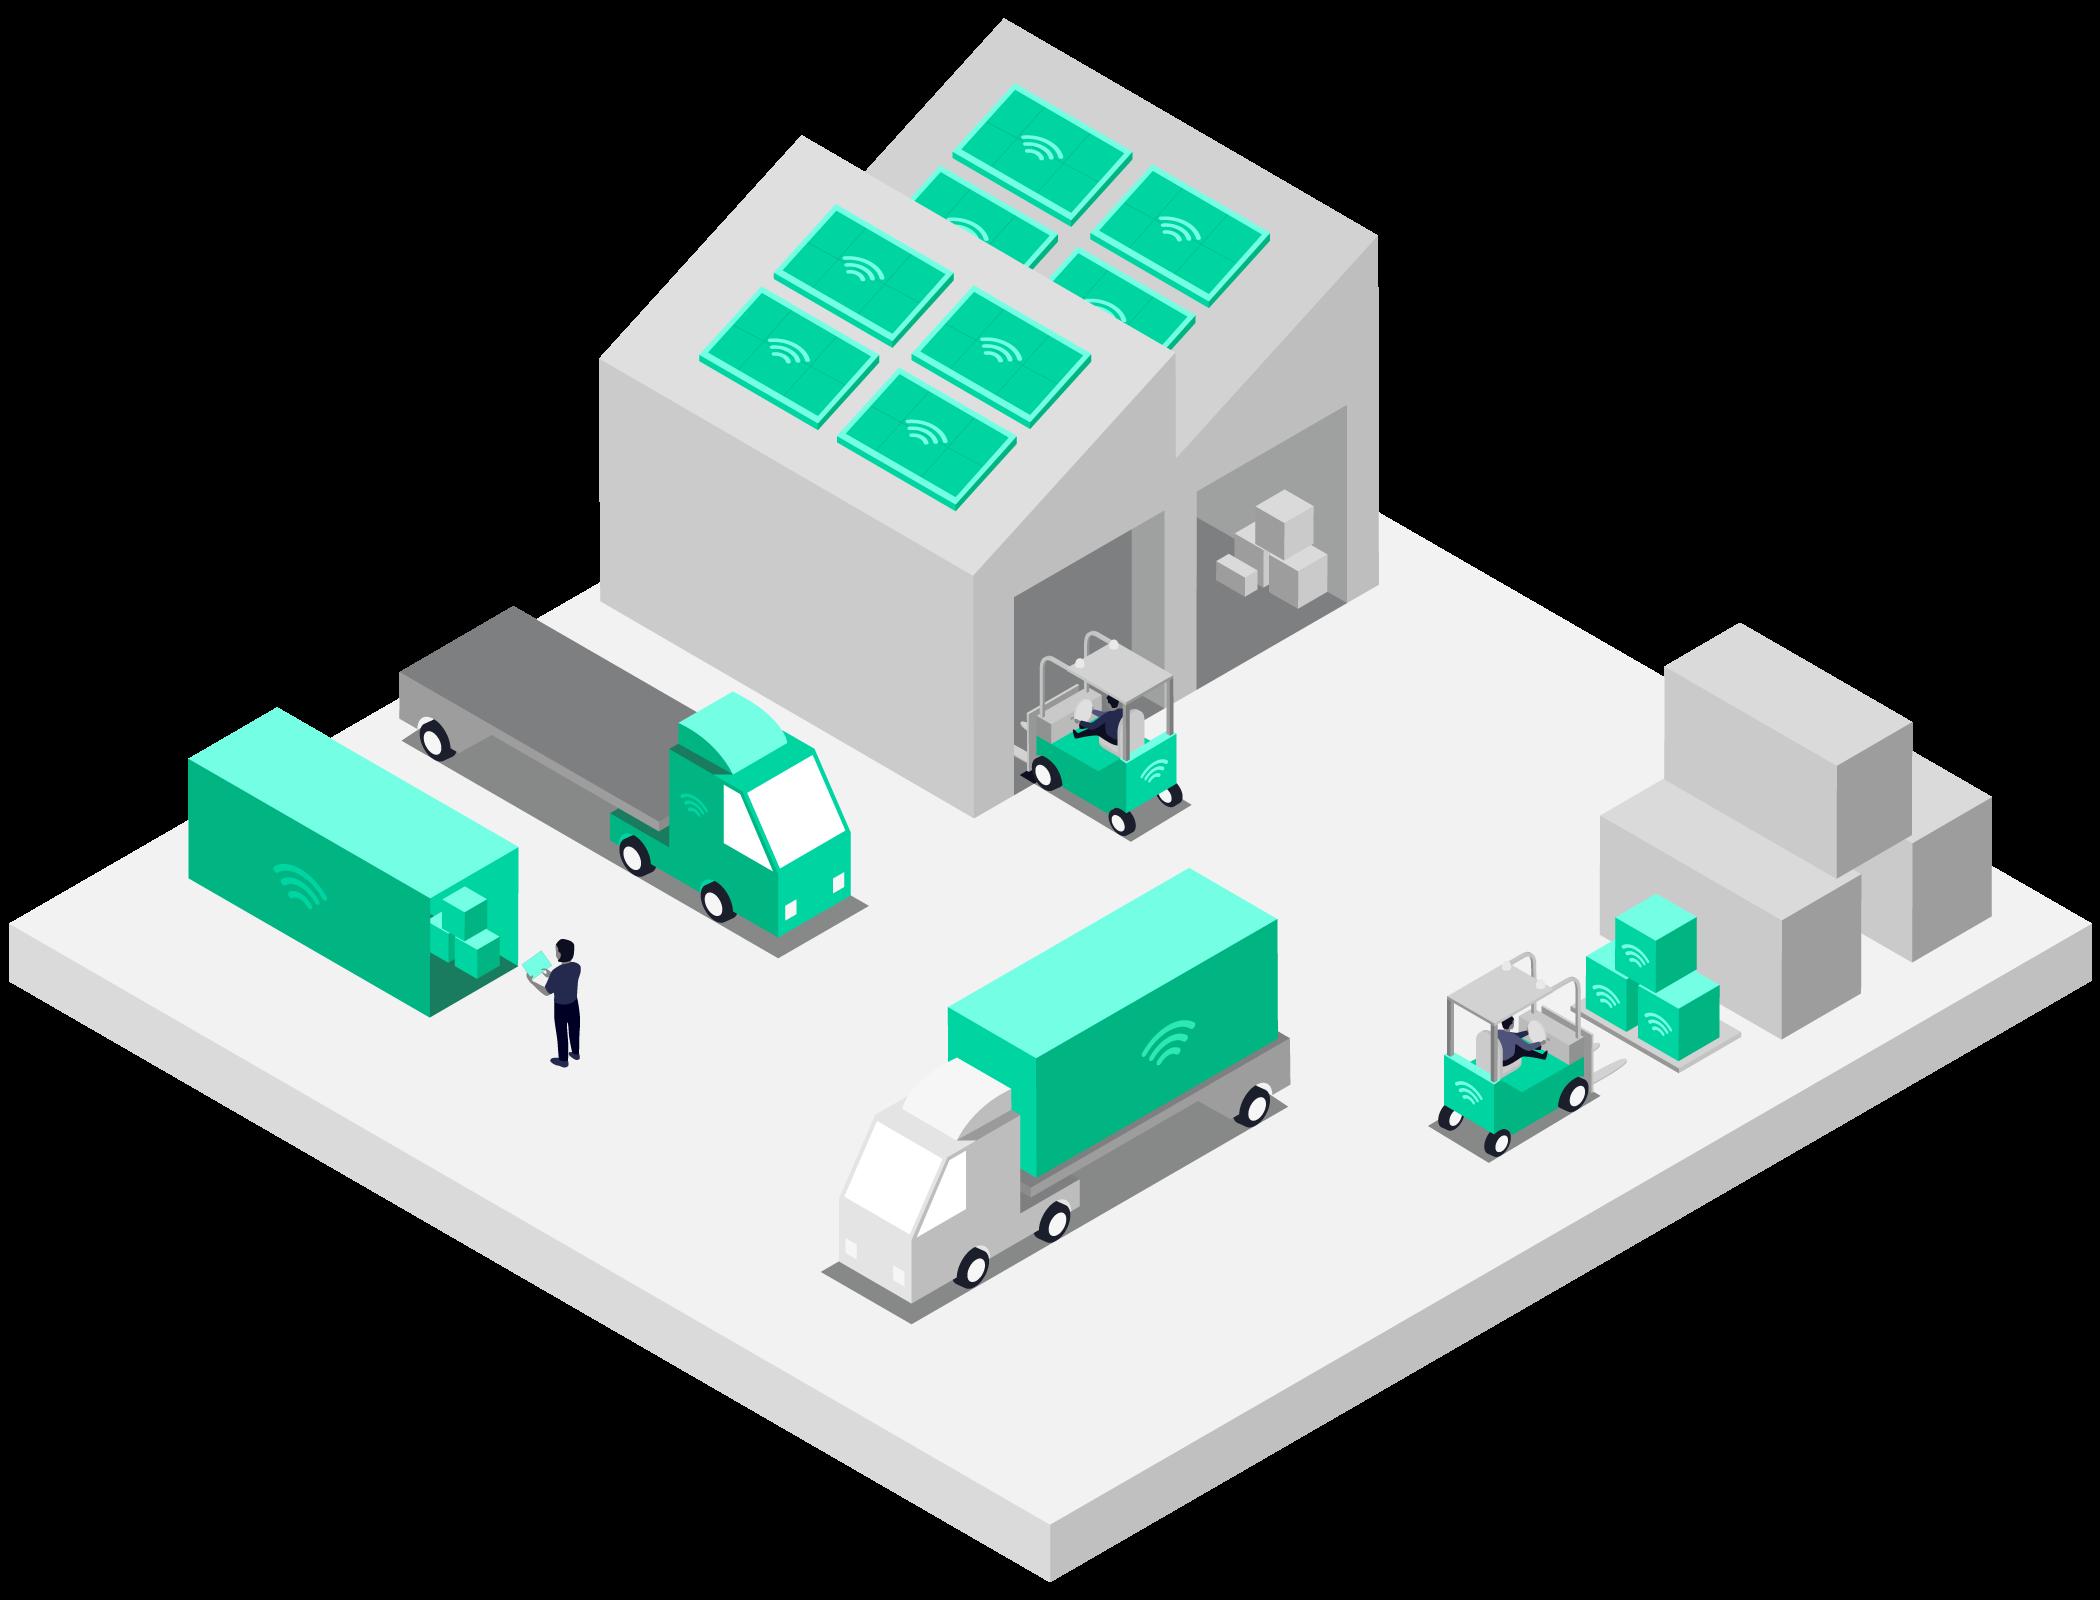 Logistics scene showing Pangea IoT SIM cards in use